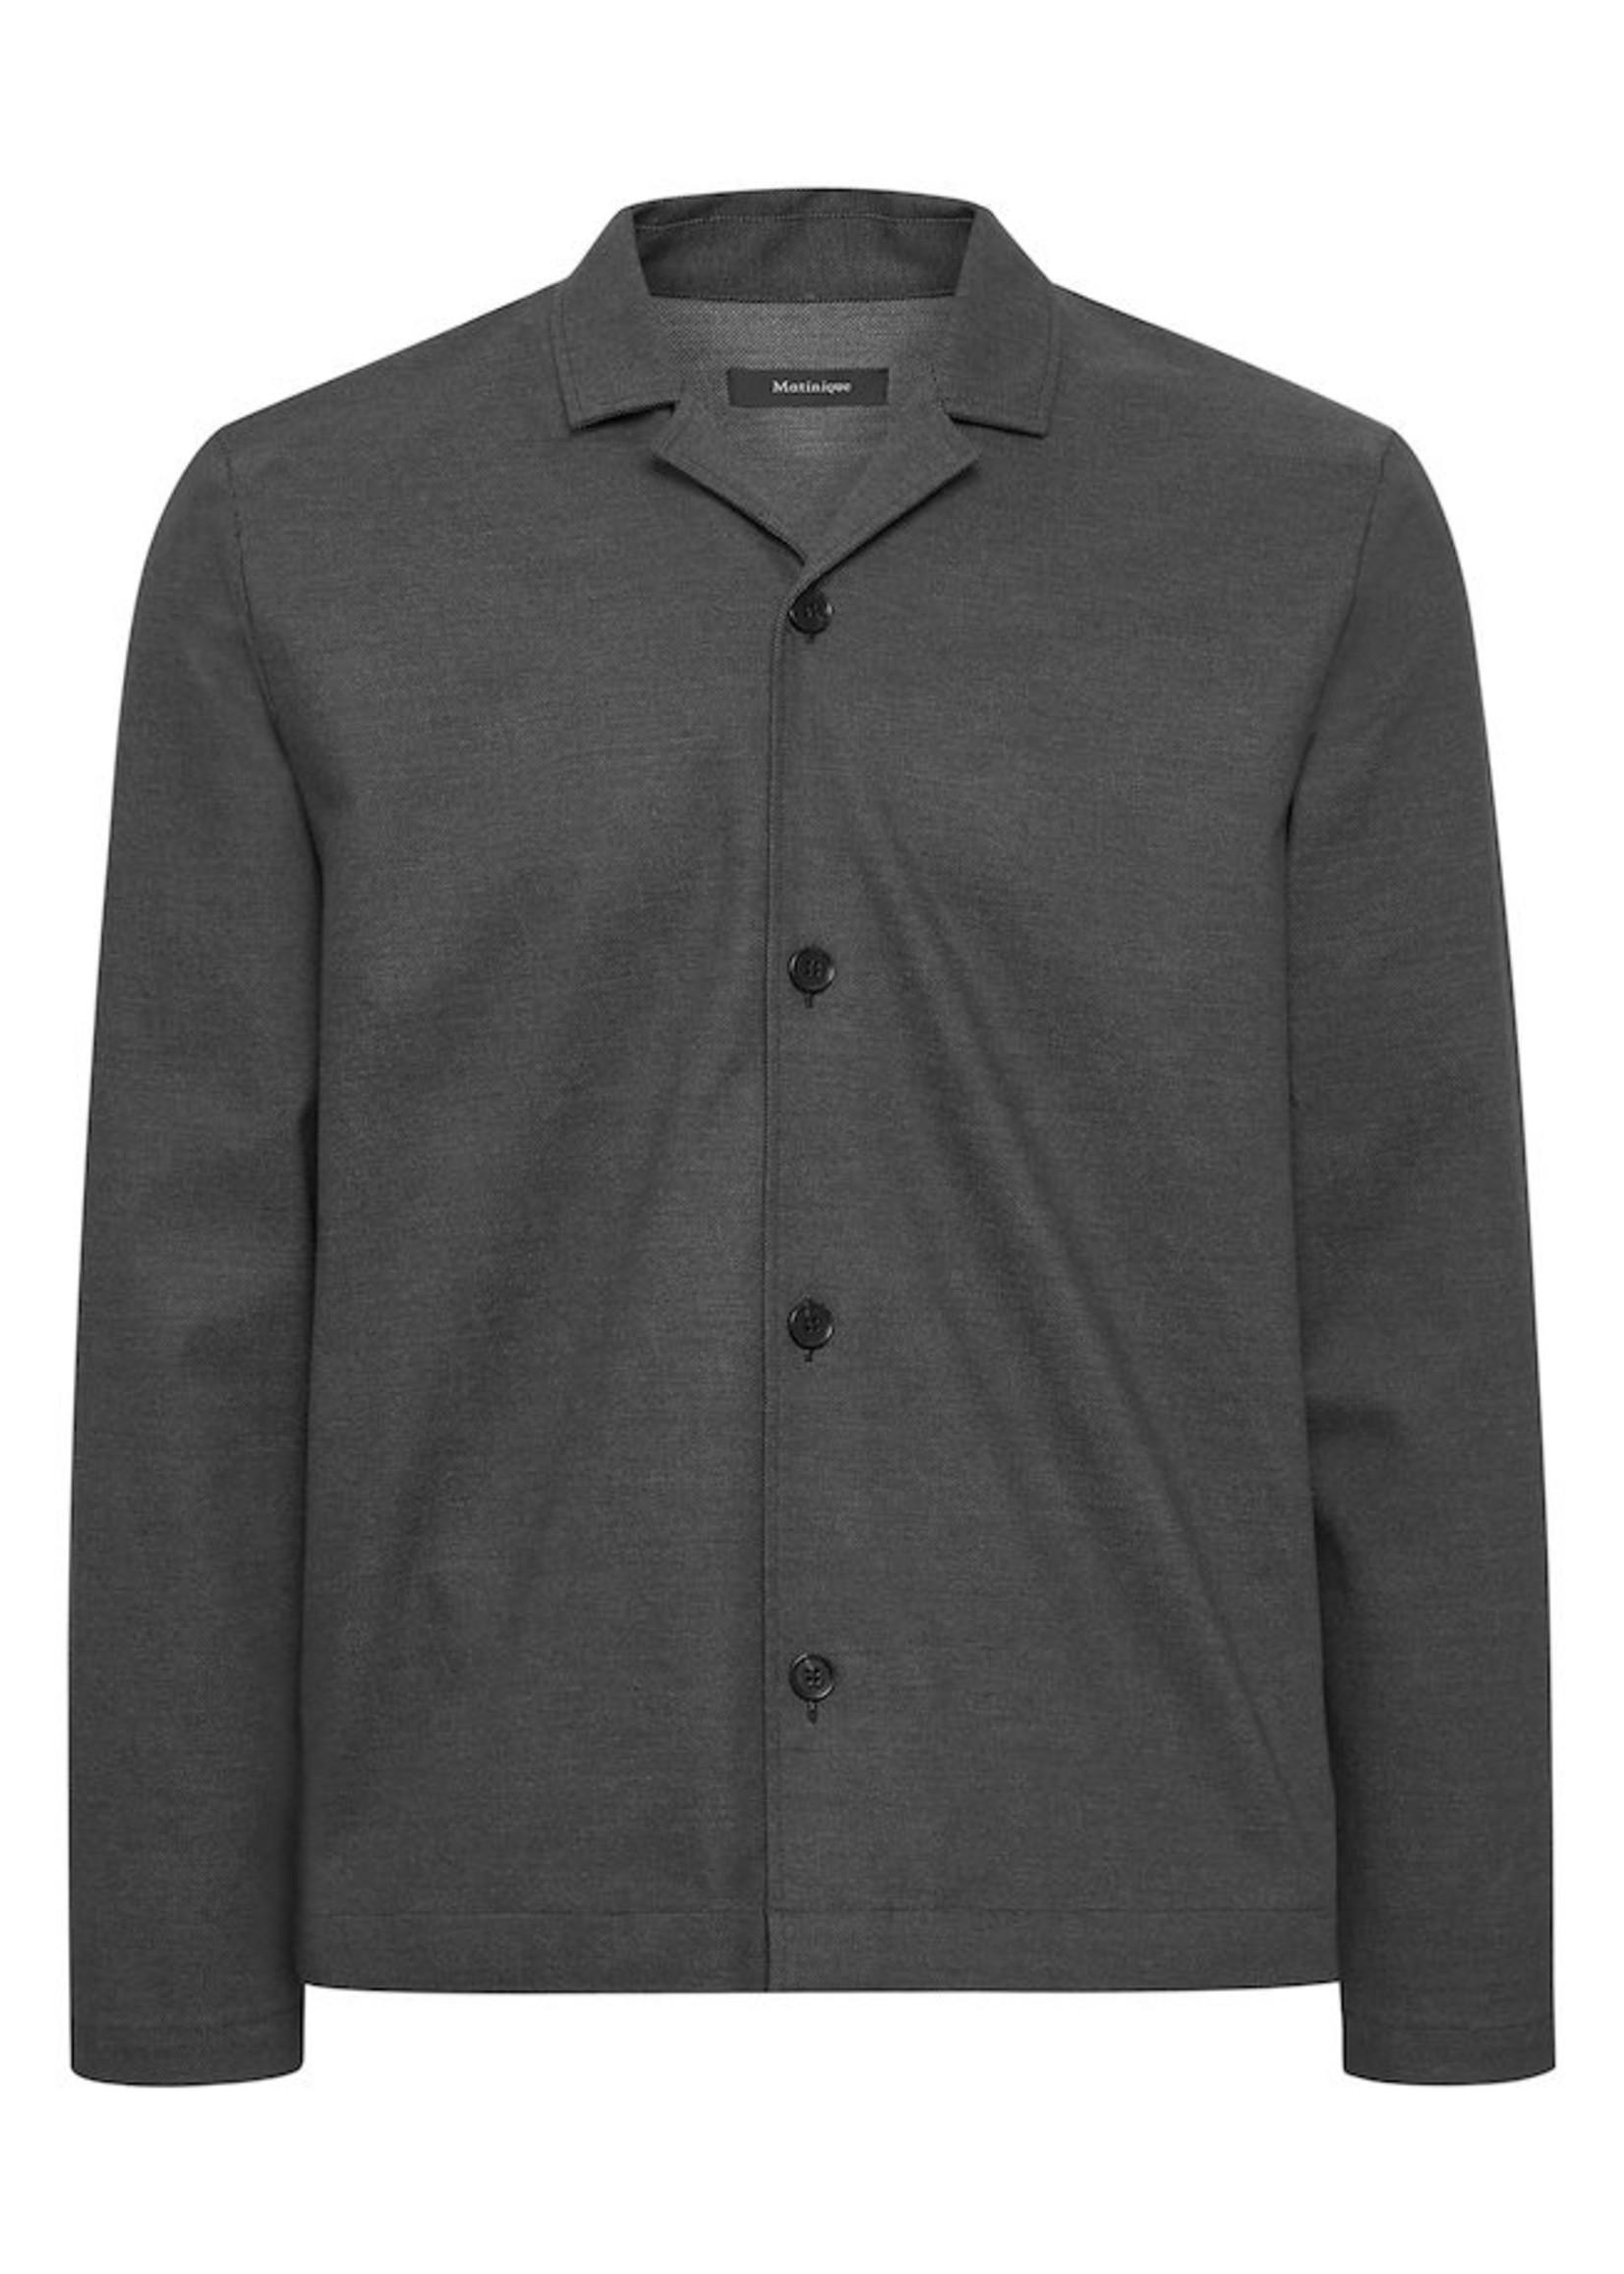 Matinique 30205212 MAjules Resort Shirt Jacket